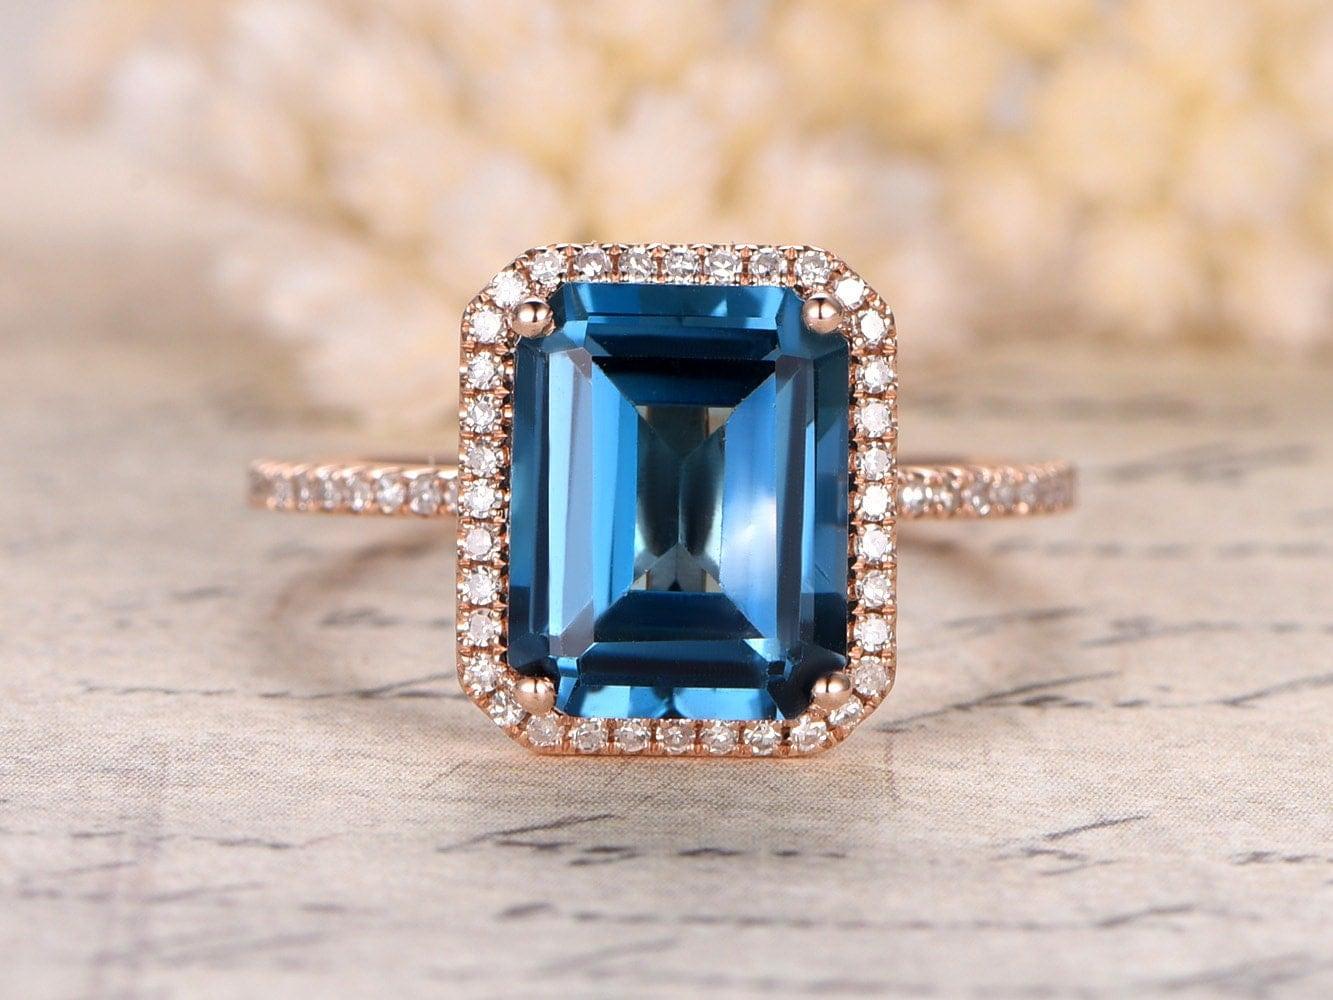 London Blue Topaz Ring8x10mm Emerald Cut Topaz Engagement